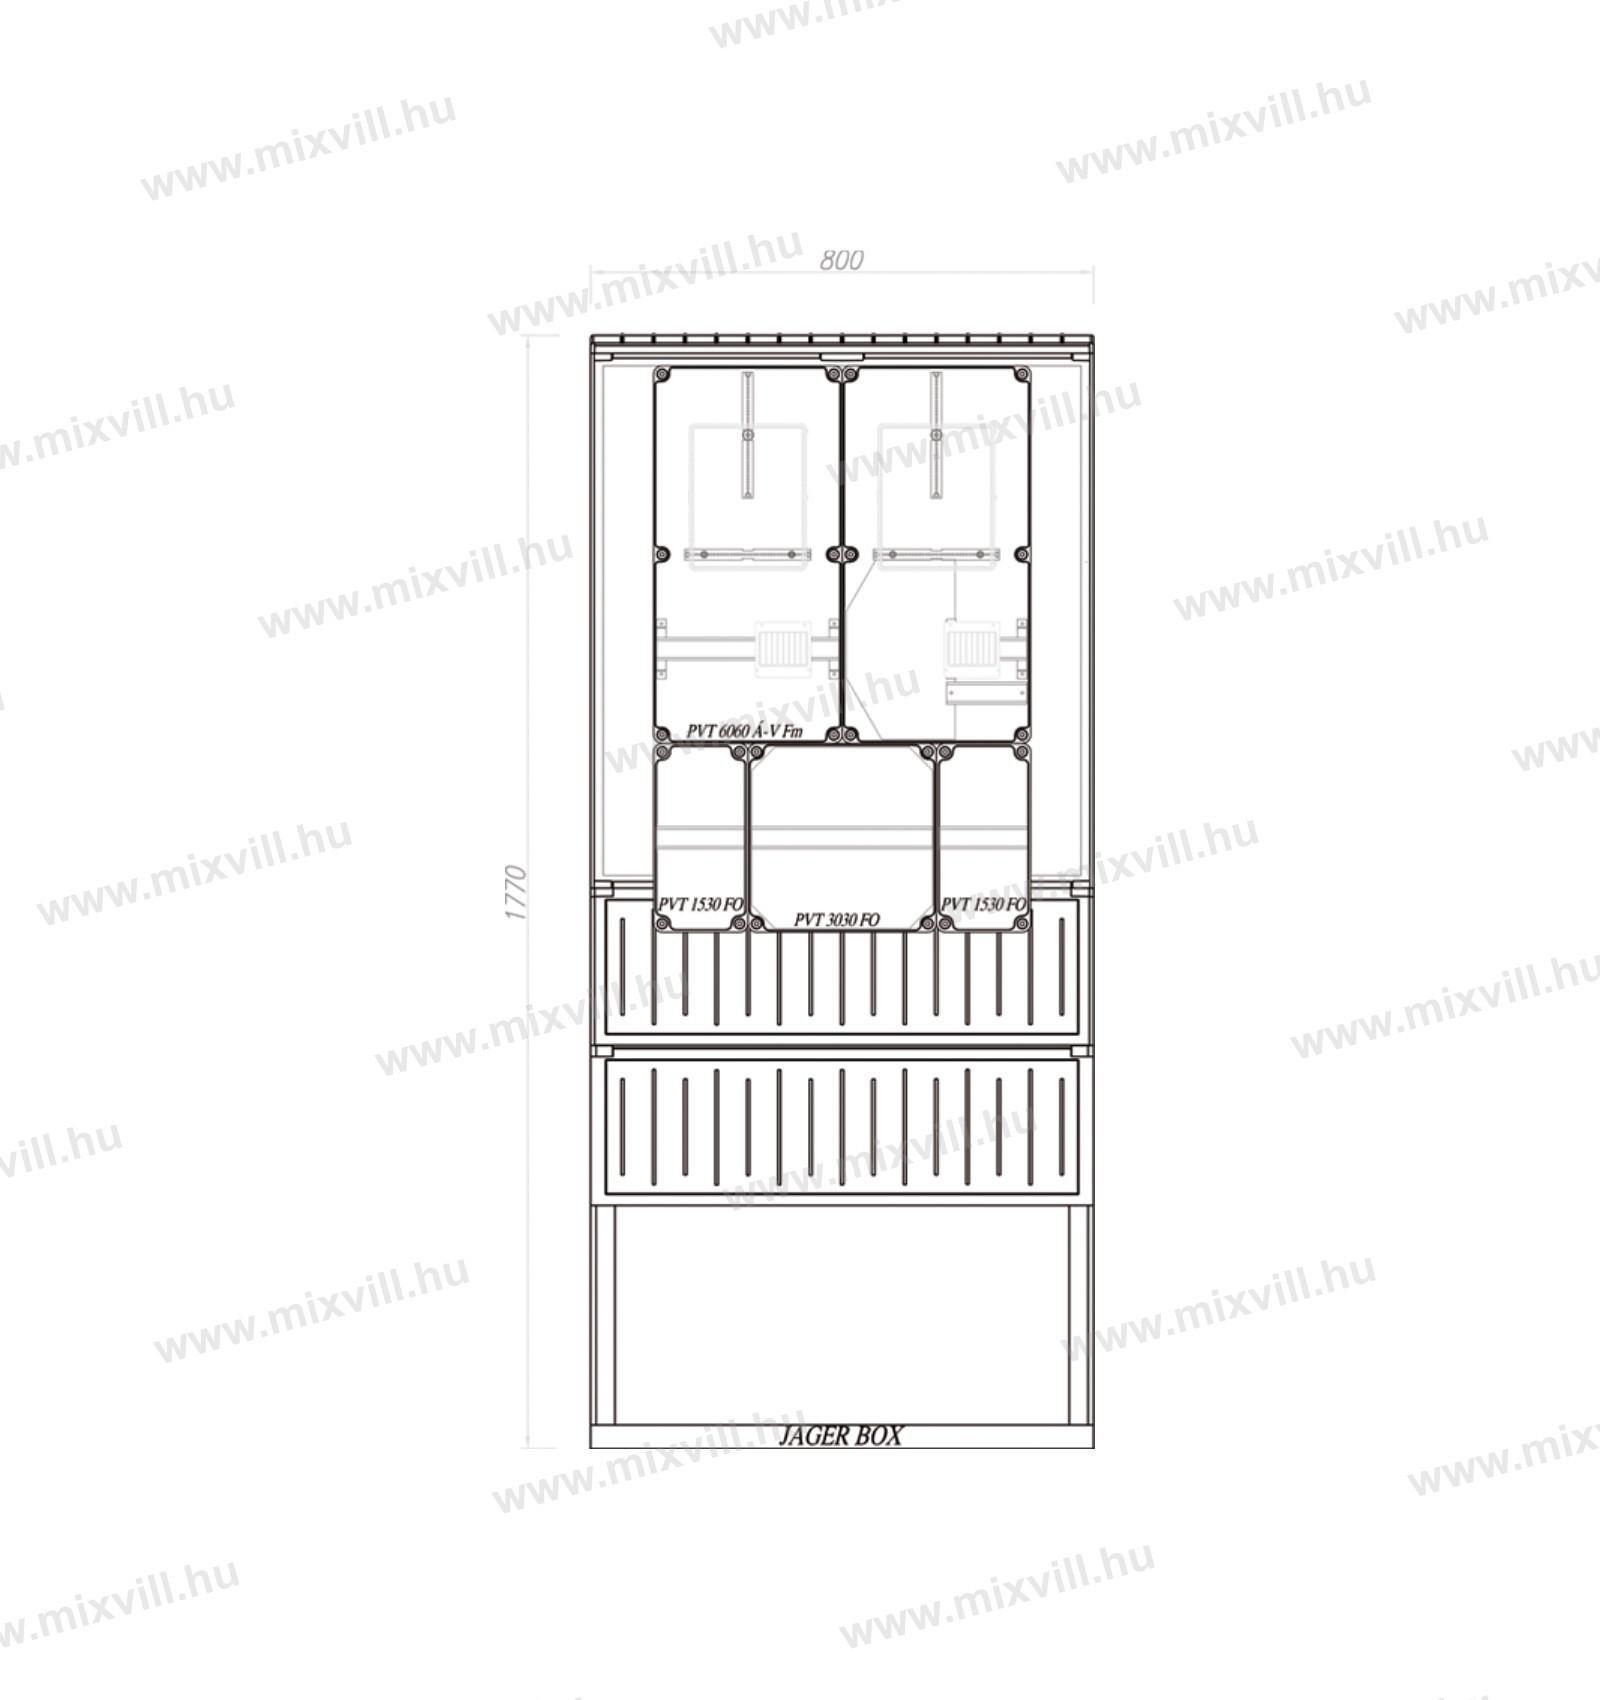 CSPEA-72000010-pvt-k-l-eon-3-fm-av-fm-labazati-szekreny-foldbe-telepitheto-direkt-haromfazisu